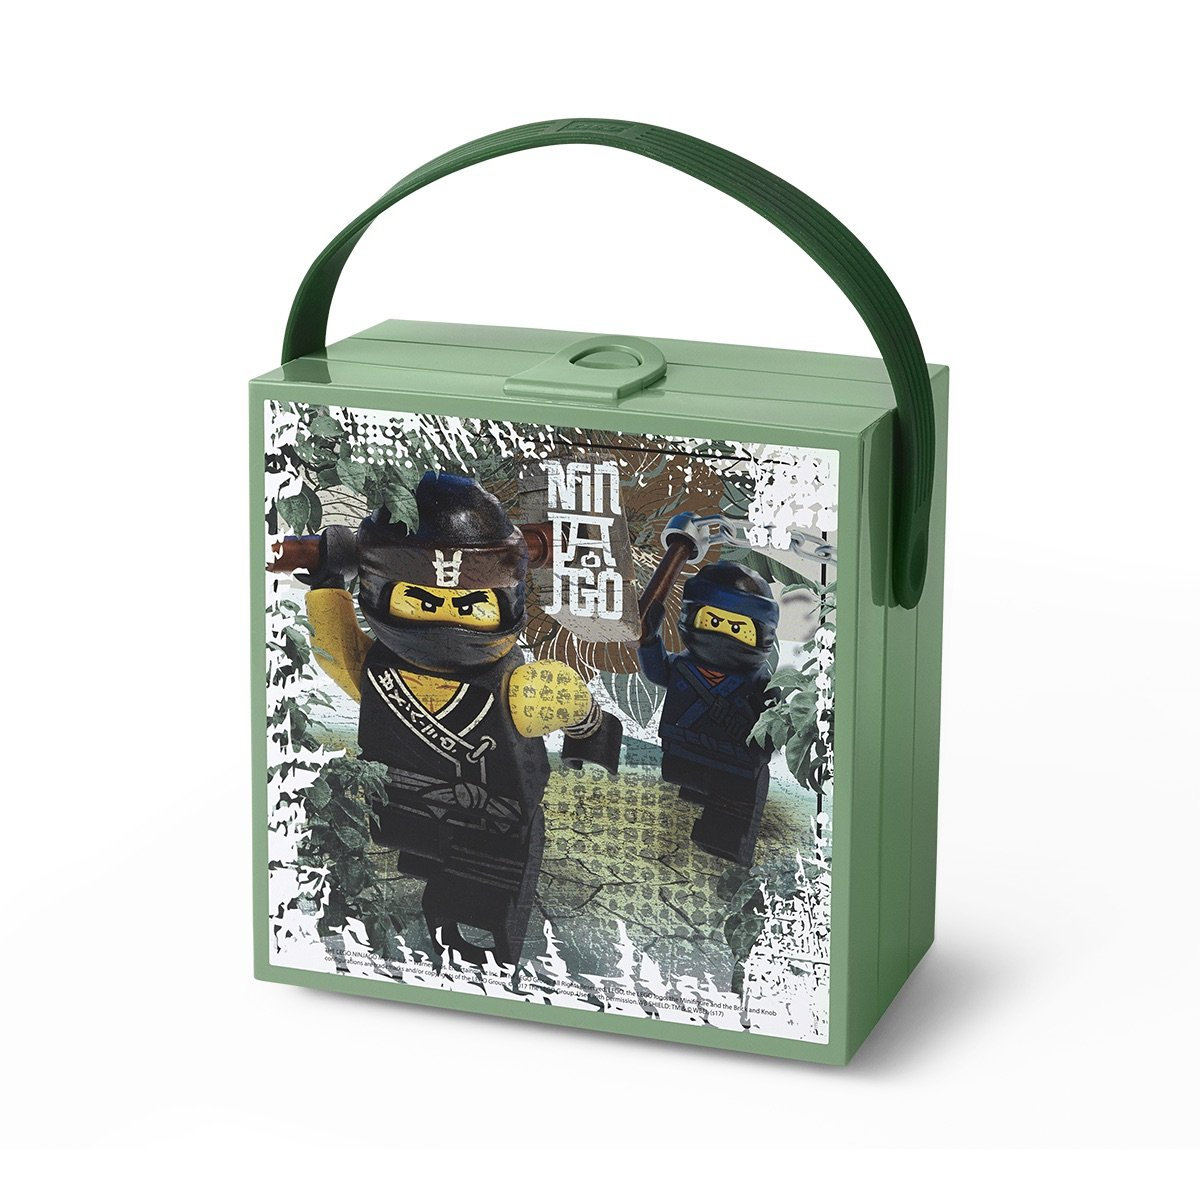 LEGO Ninjago Movie Lunchbox with Handle, Sand Green